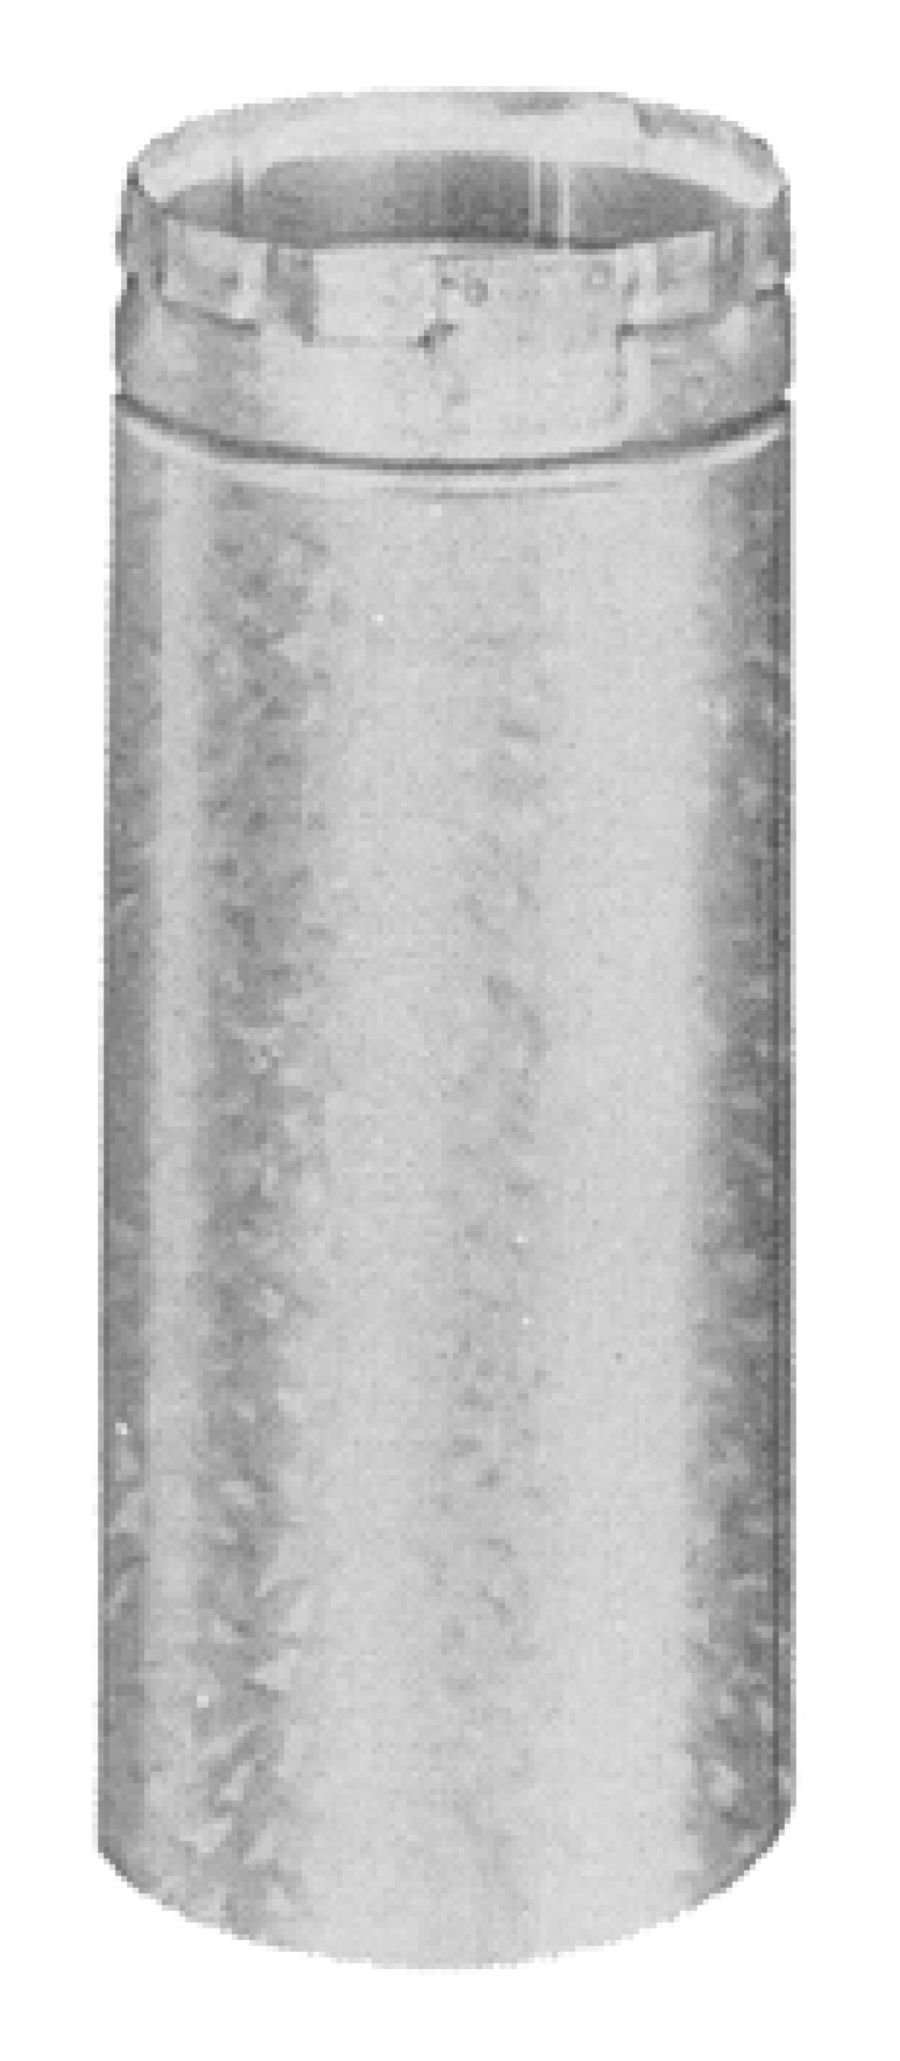 AV_E12A_TBGV Adjustable Length